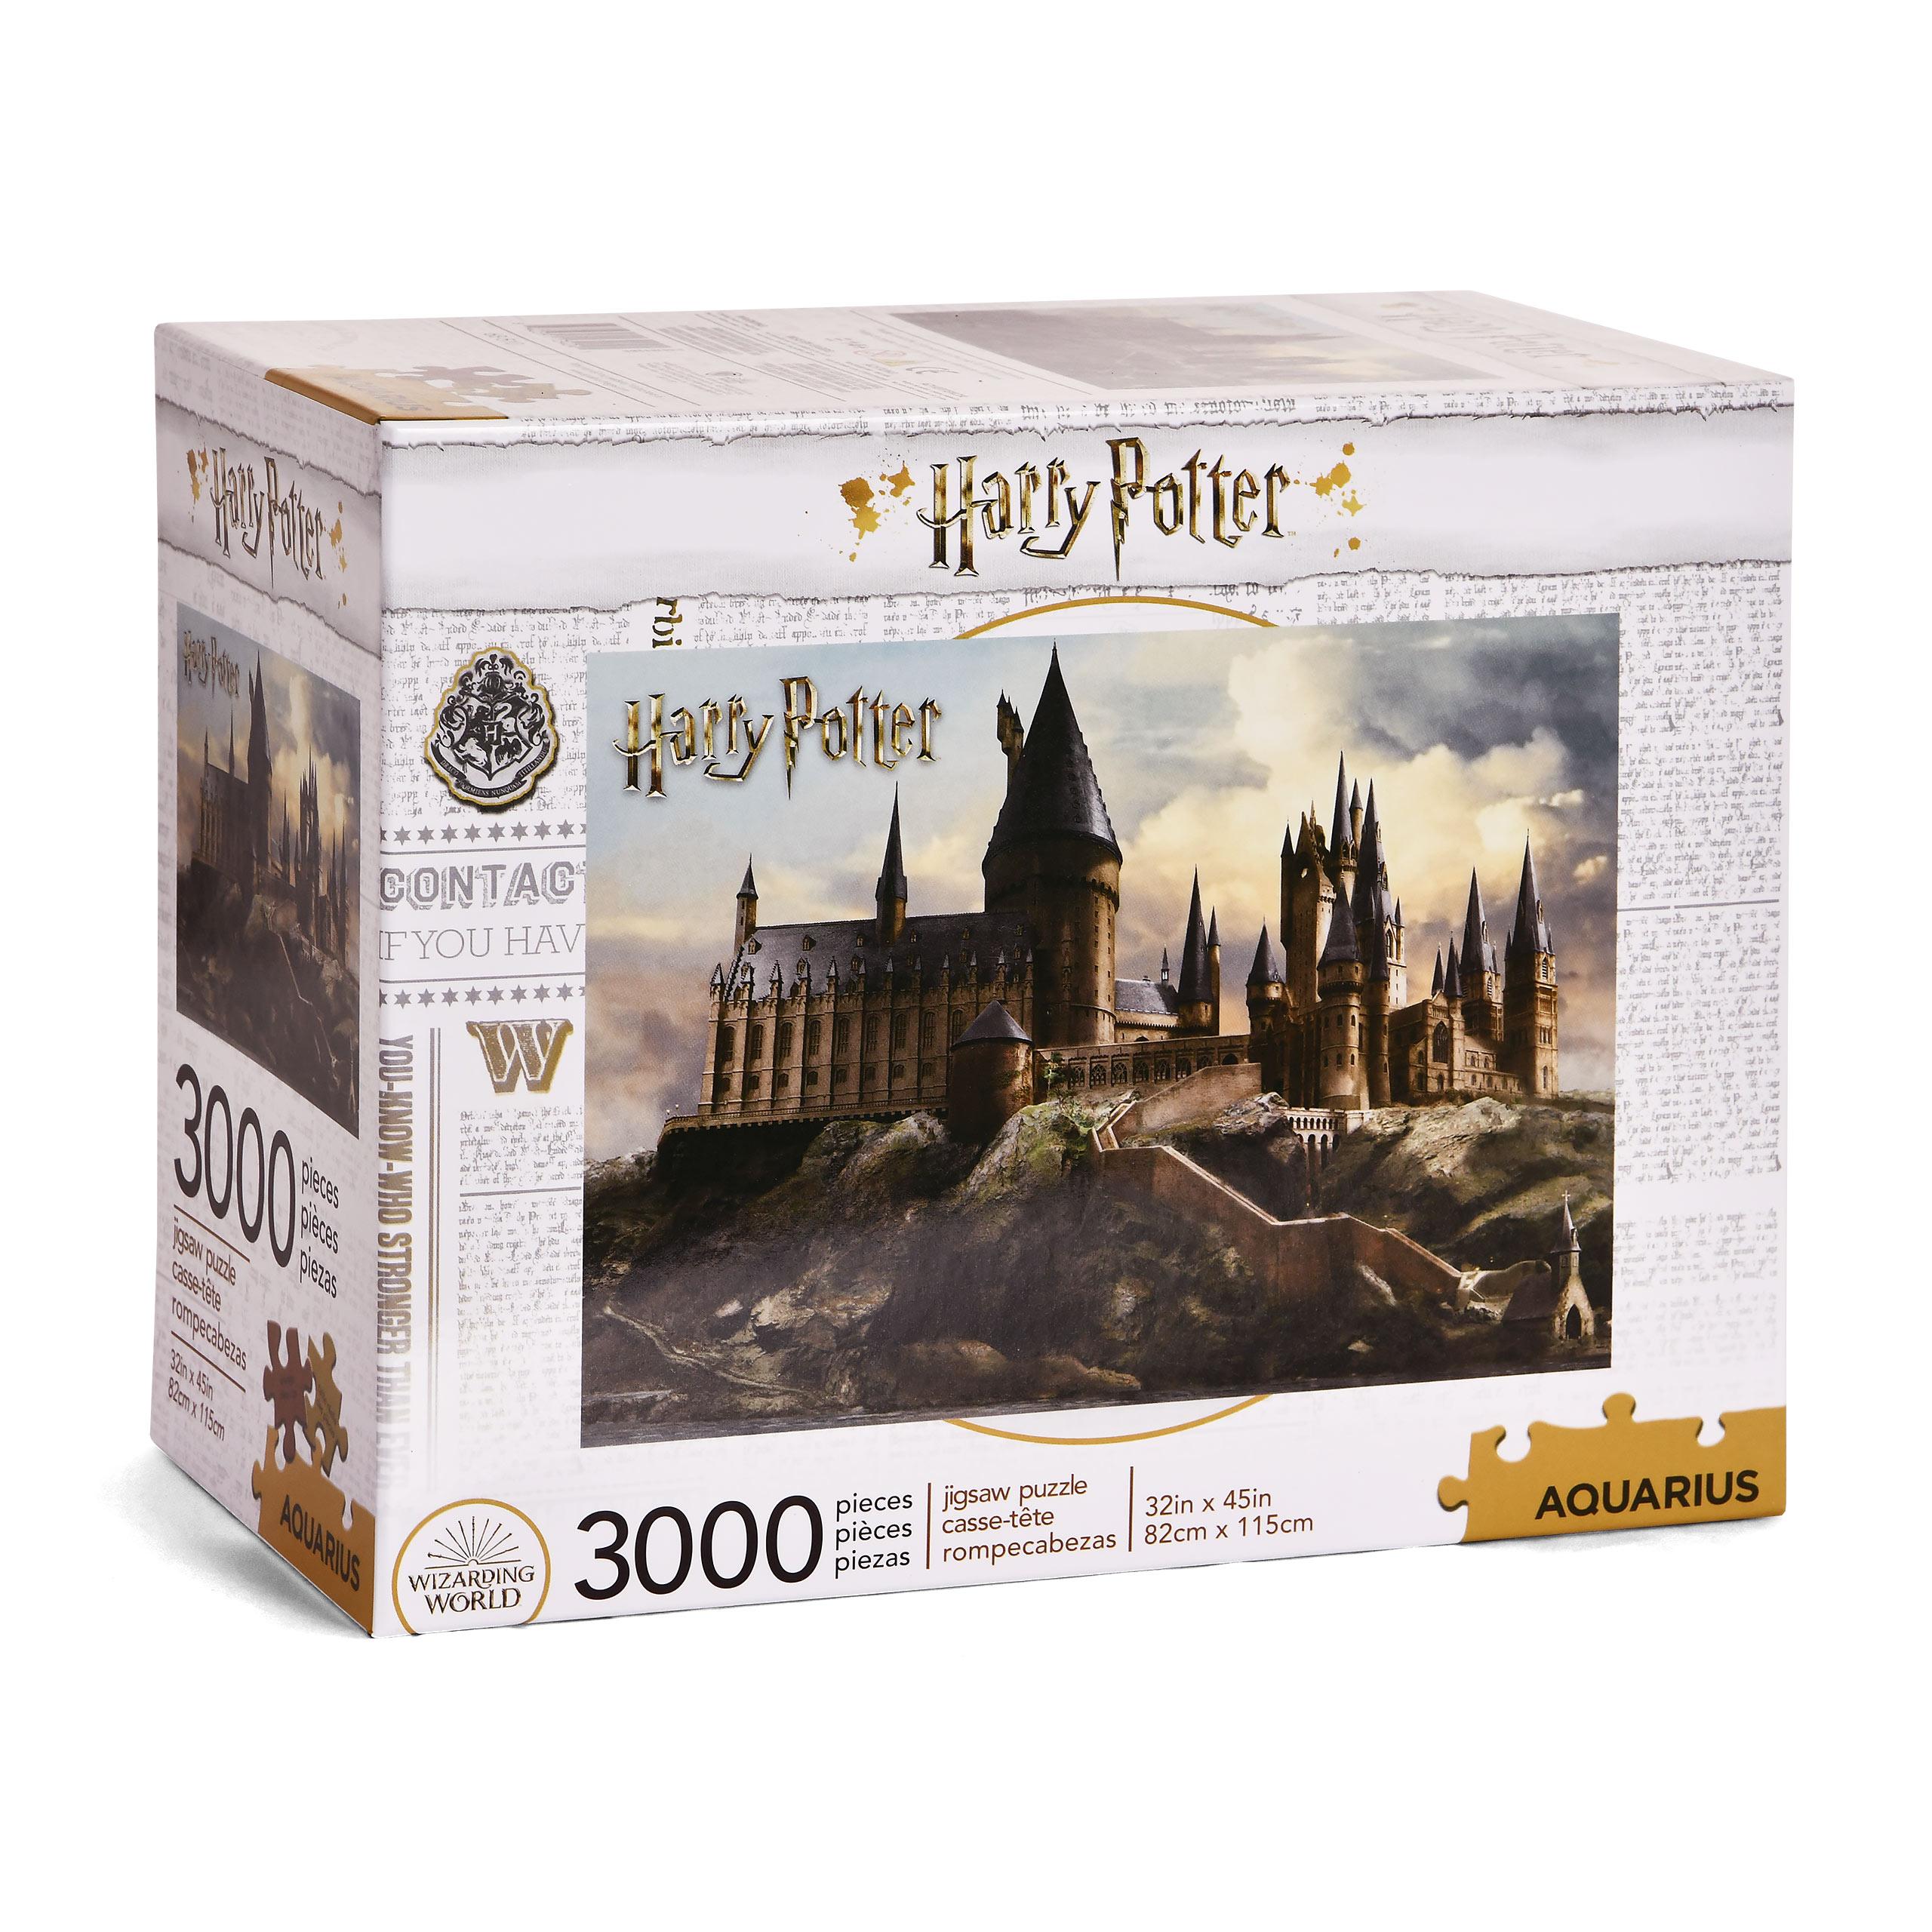 Harry Potter - Hogwarts Schloss Puzzle 3000 Teile